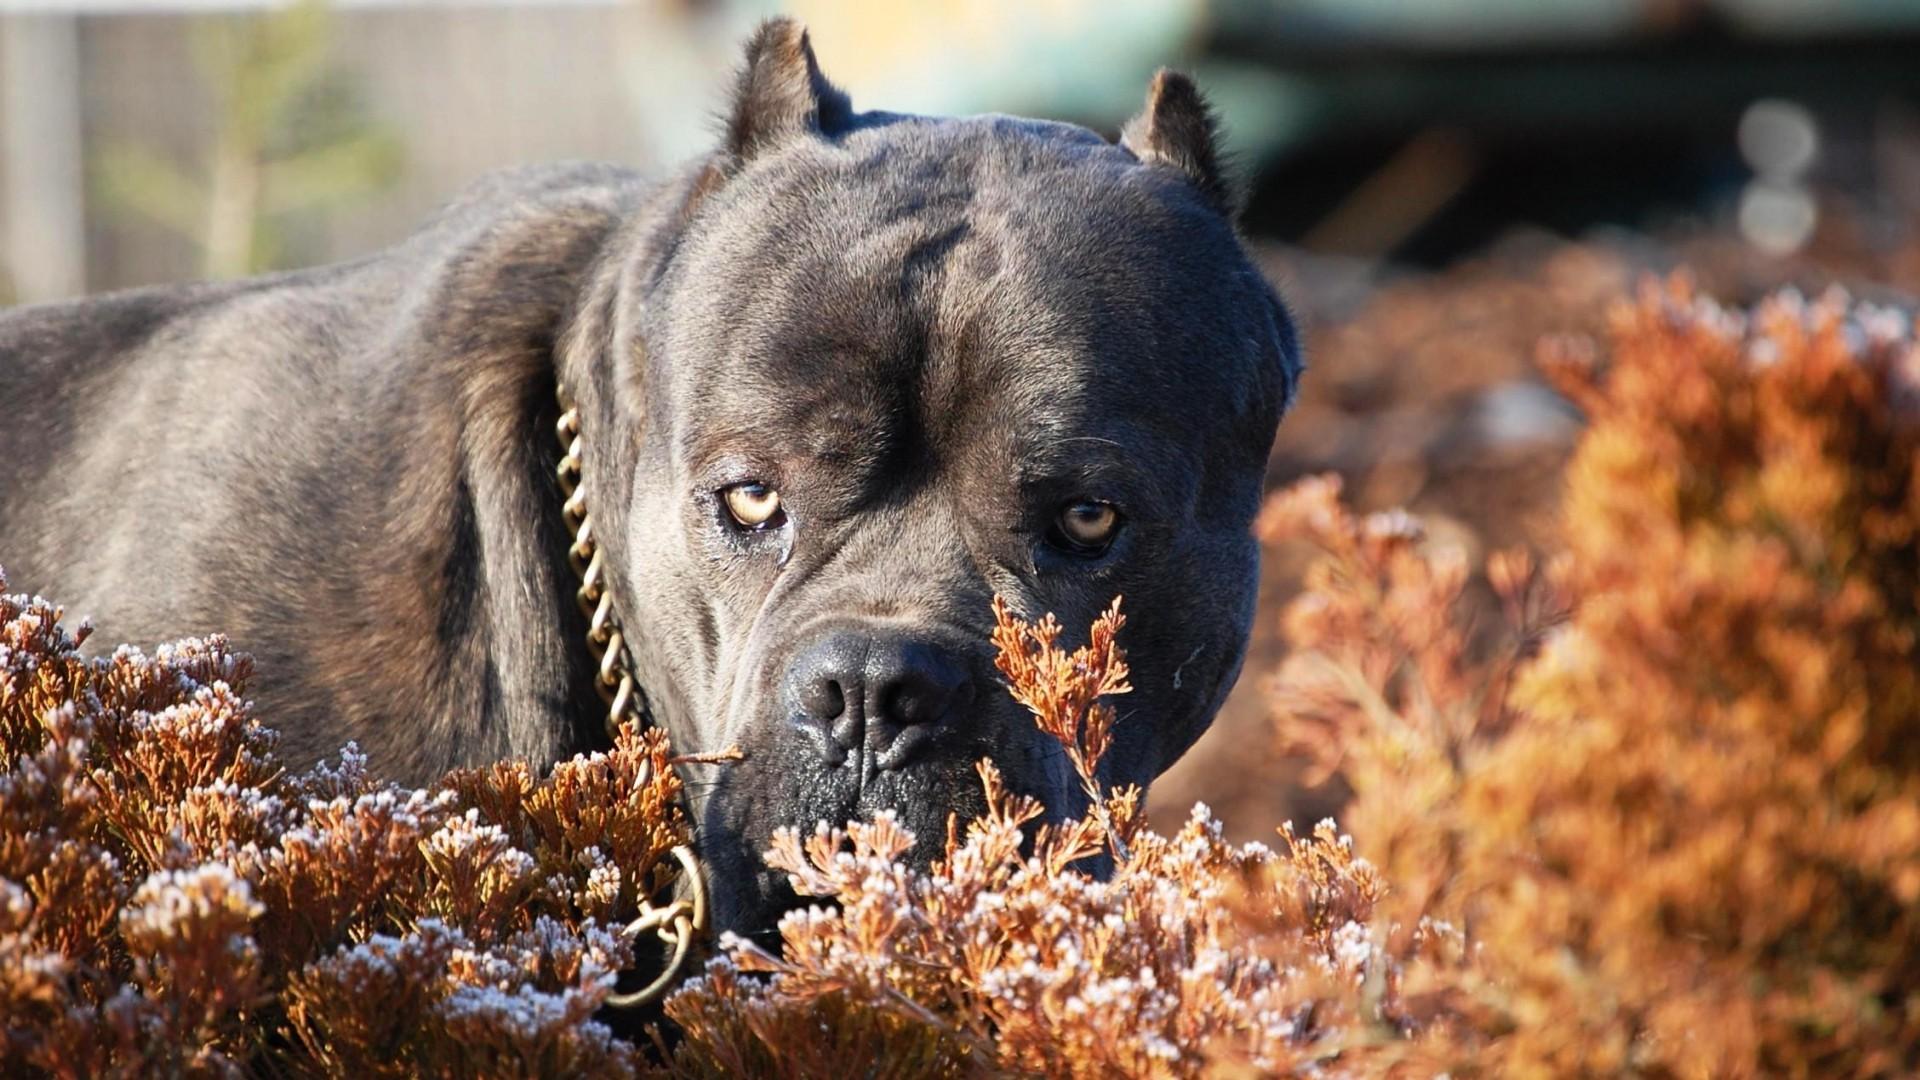 addestramento cane corso foto